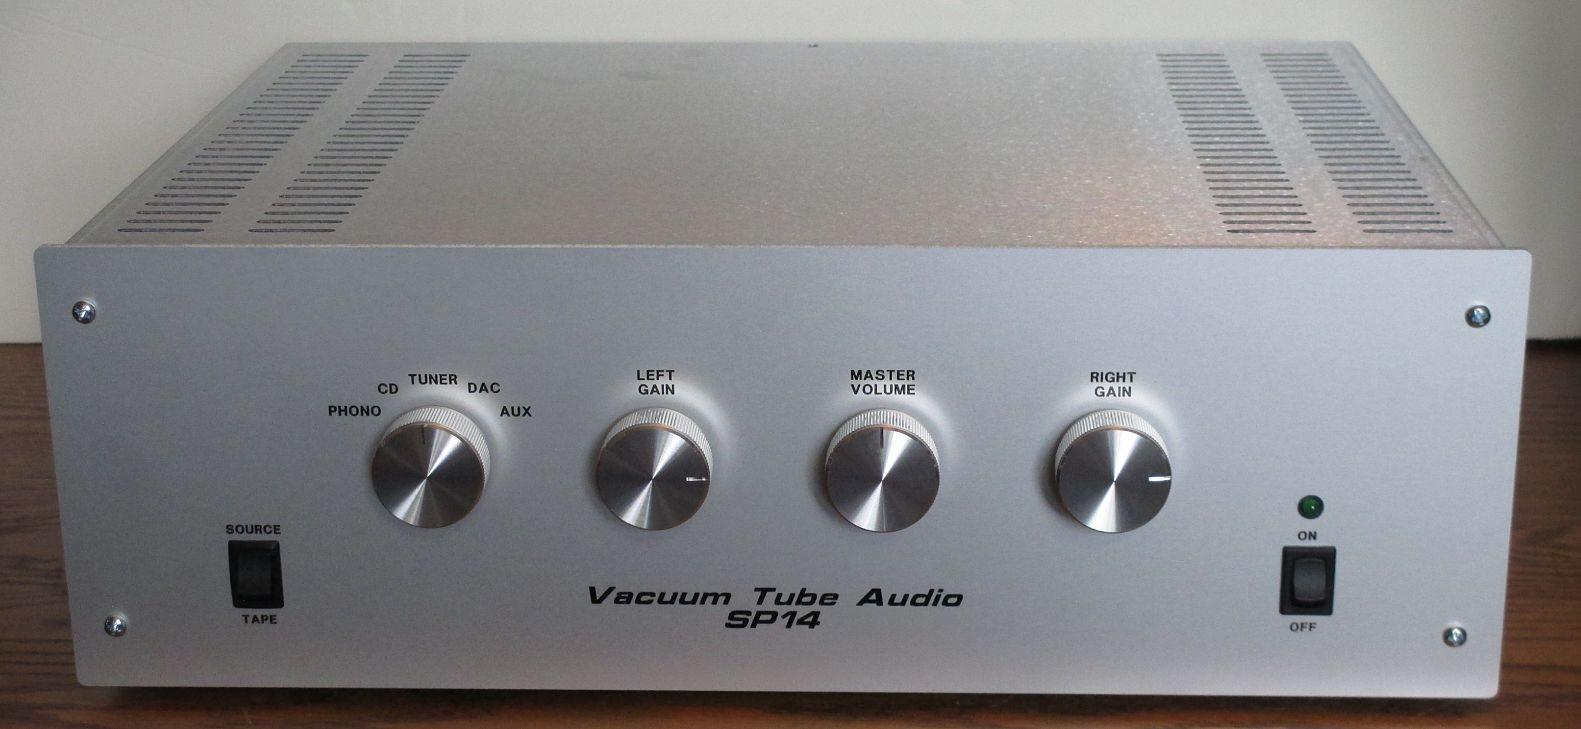 Vacuum Tube Audio preamp kits